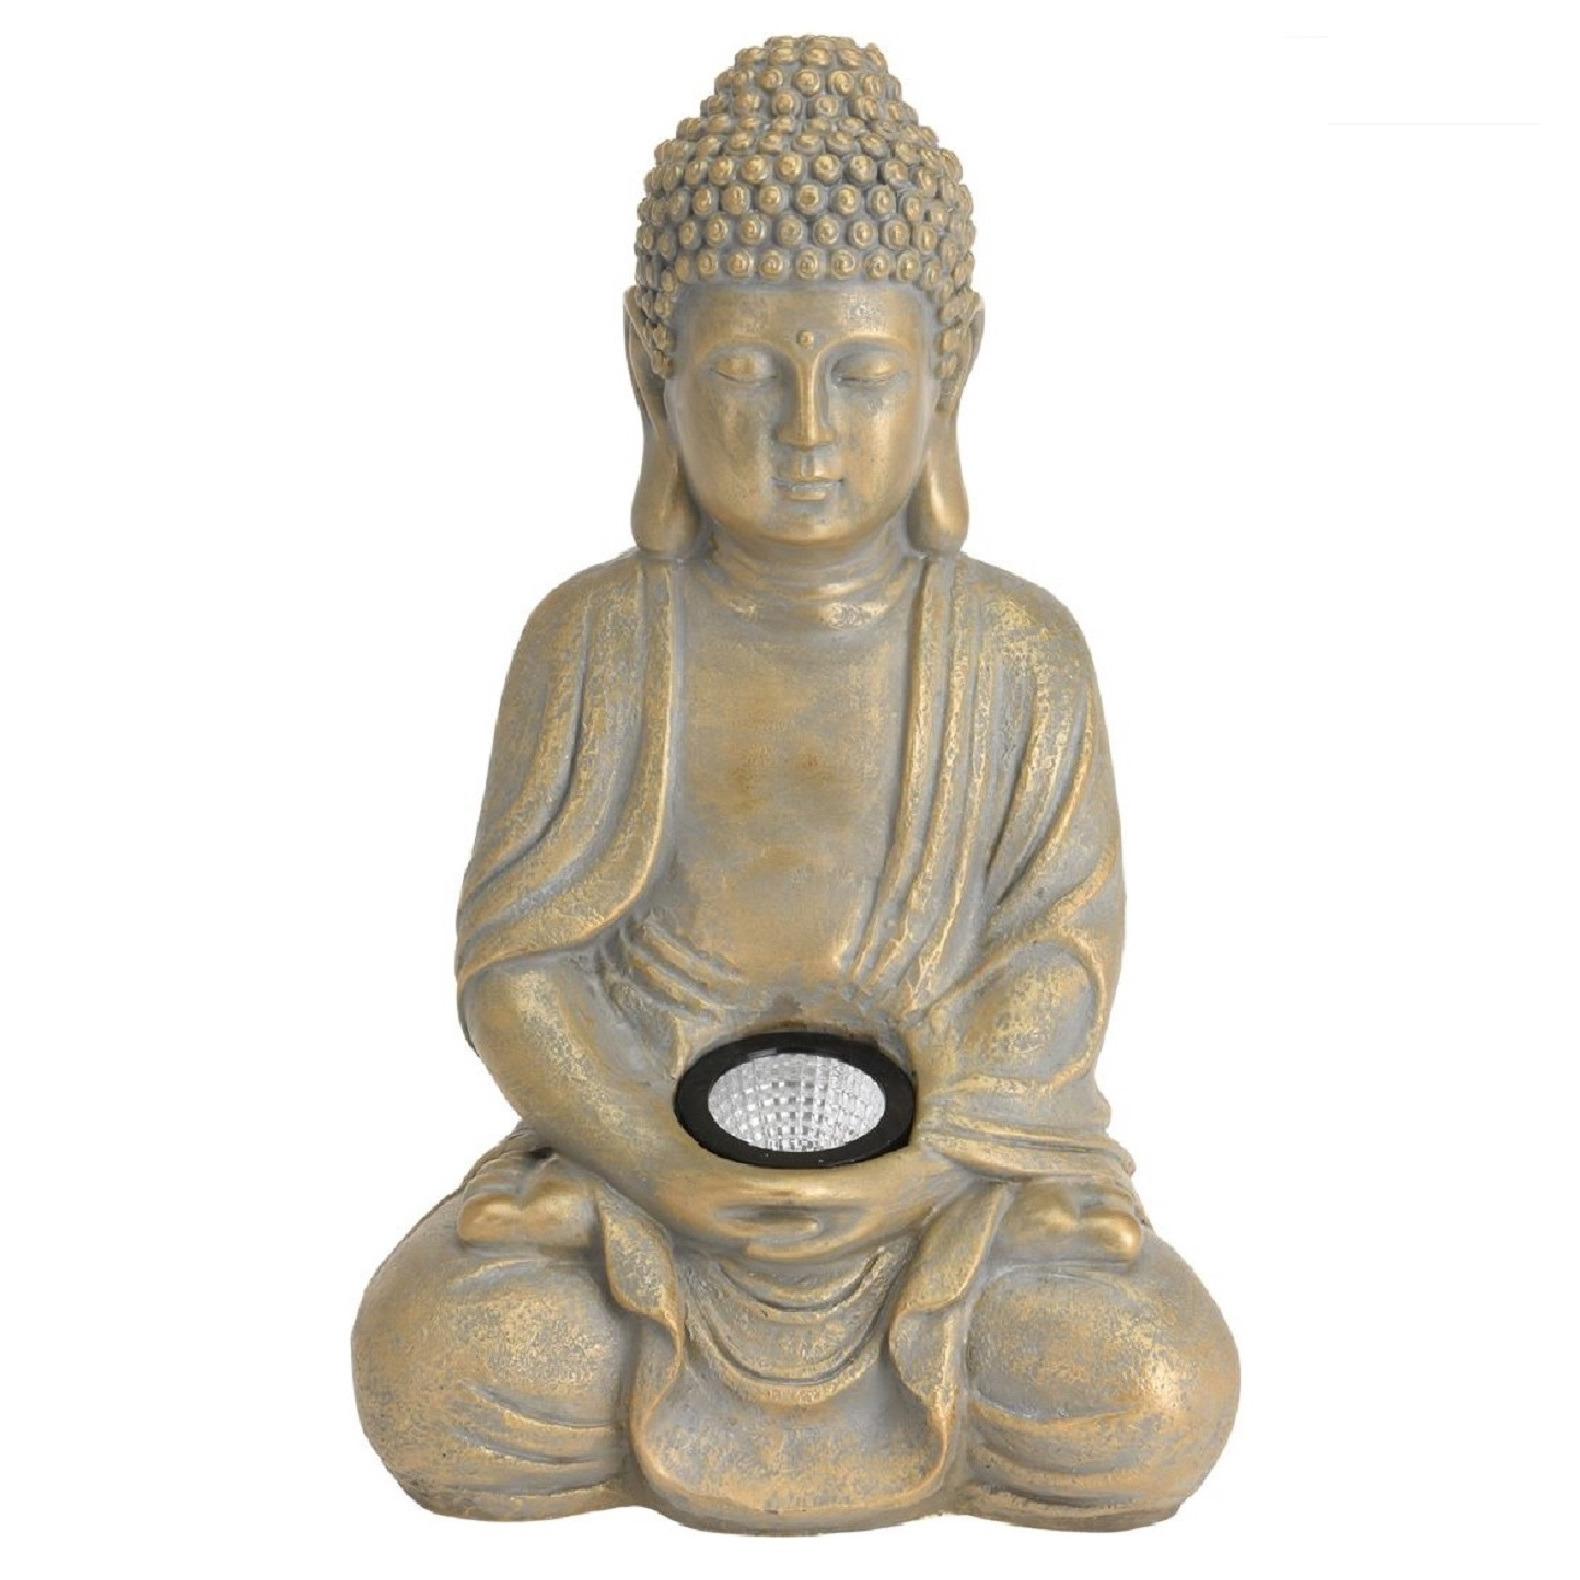 1x Boeddha tuinbeeld goud met solar verlichting op zonne-energie 33 cm